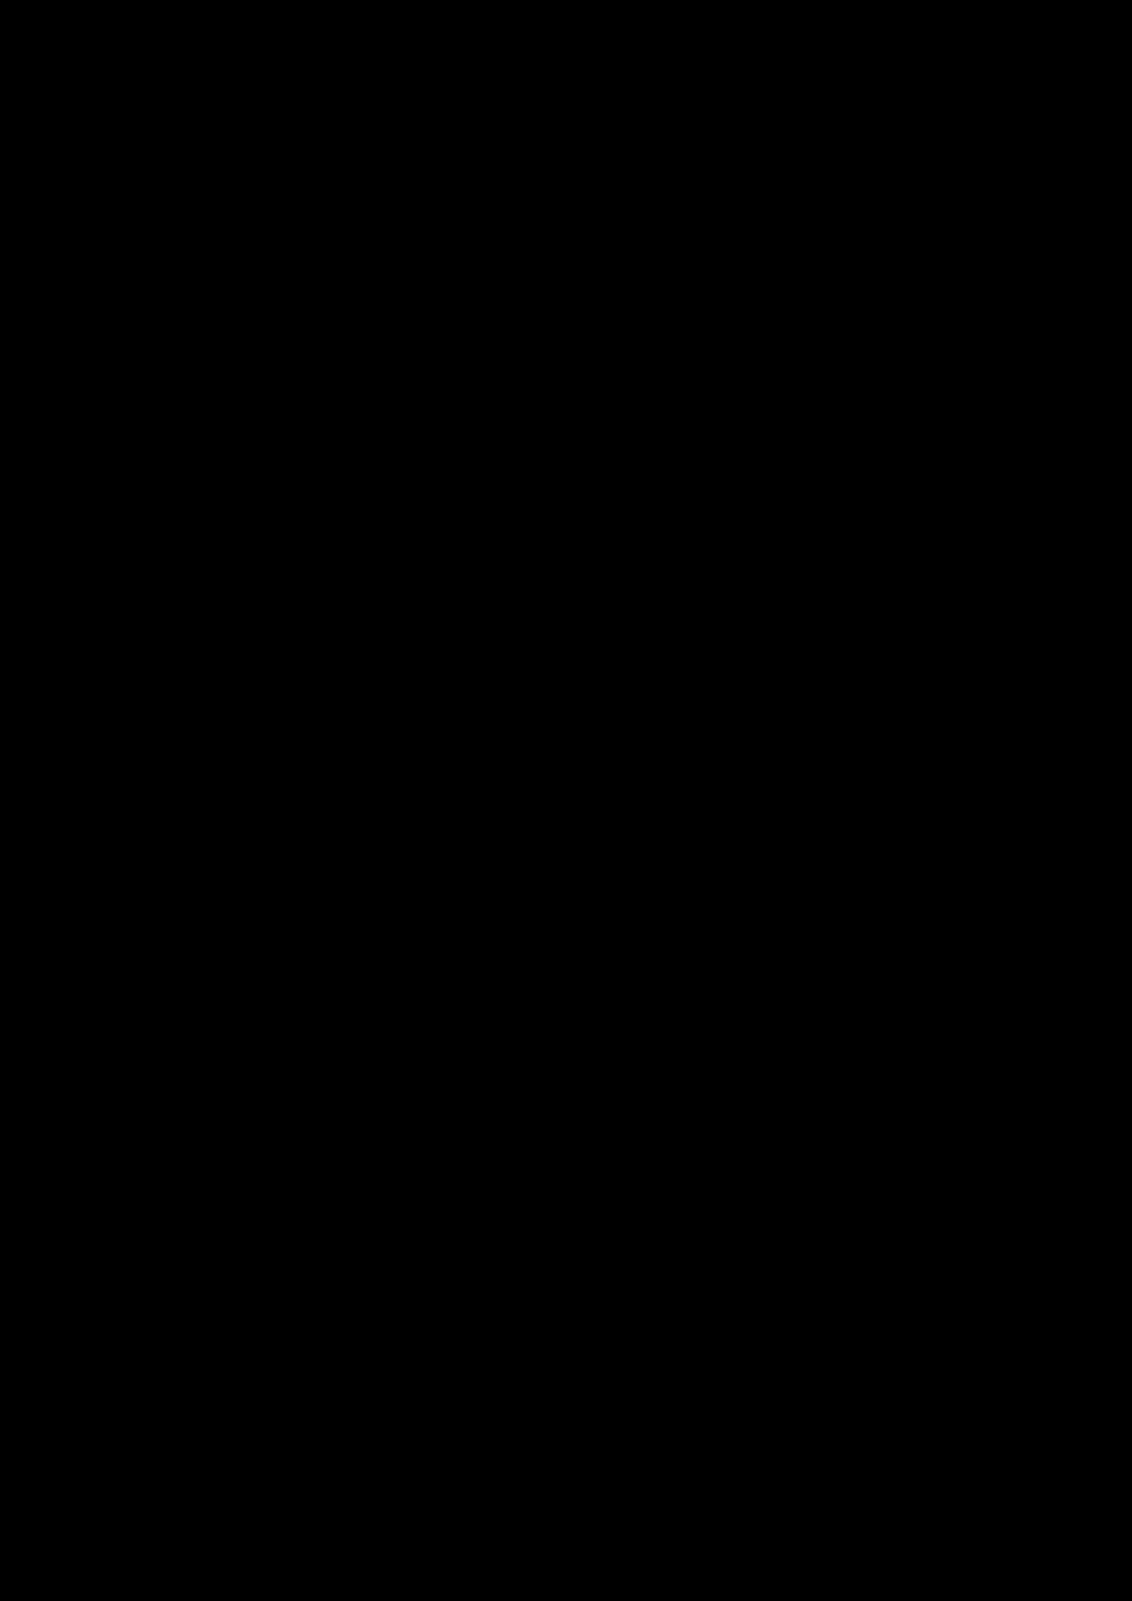 Okean Pustotyi slide, Image 9